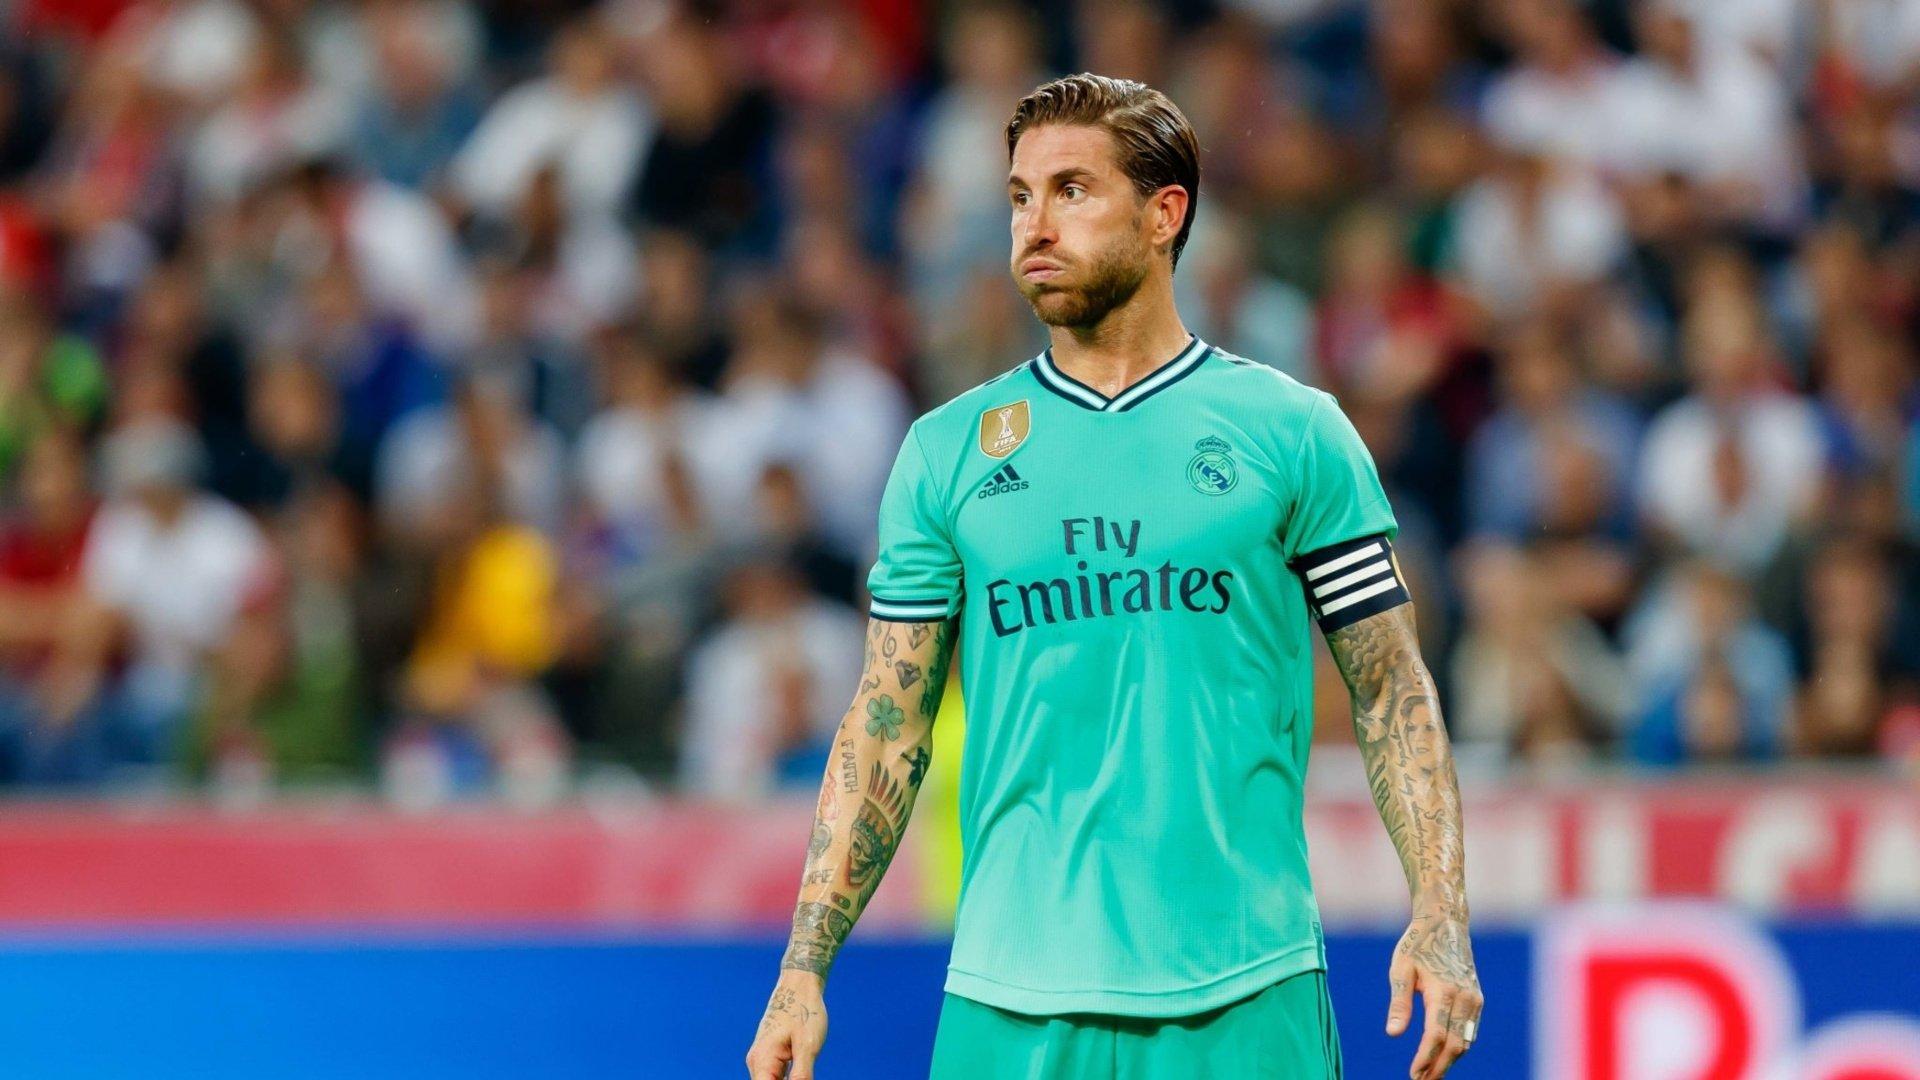 Ramos misses training ahead of Roma friendly